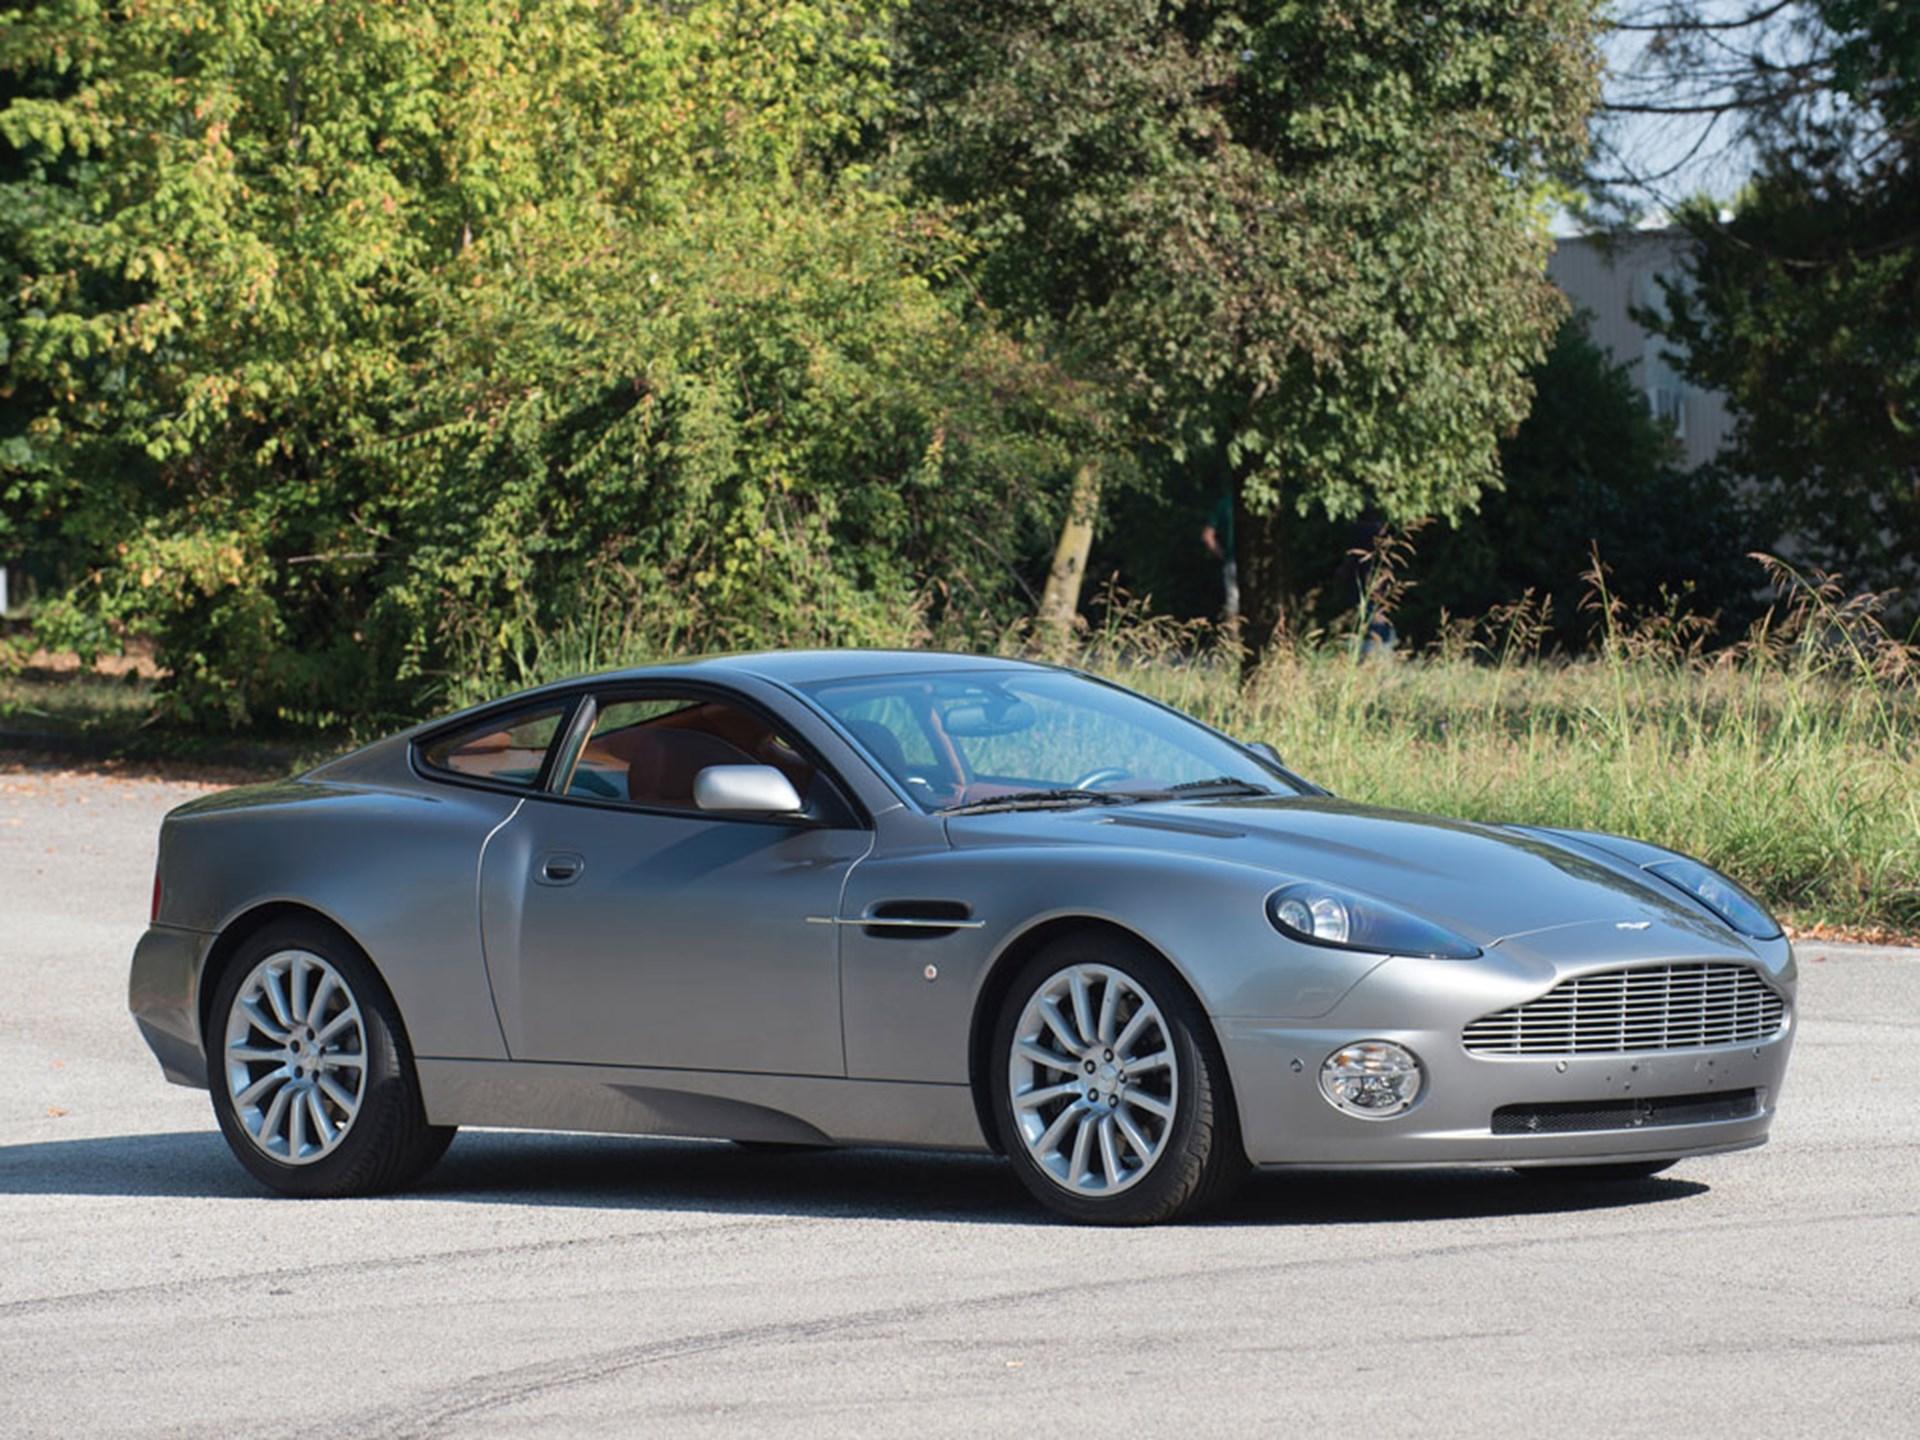 RM Sothebys Aston Martin Vanquish Duemila Ruote - 2001 aston martin vanquish